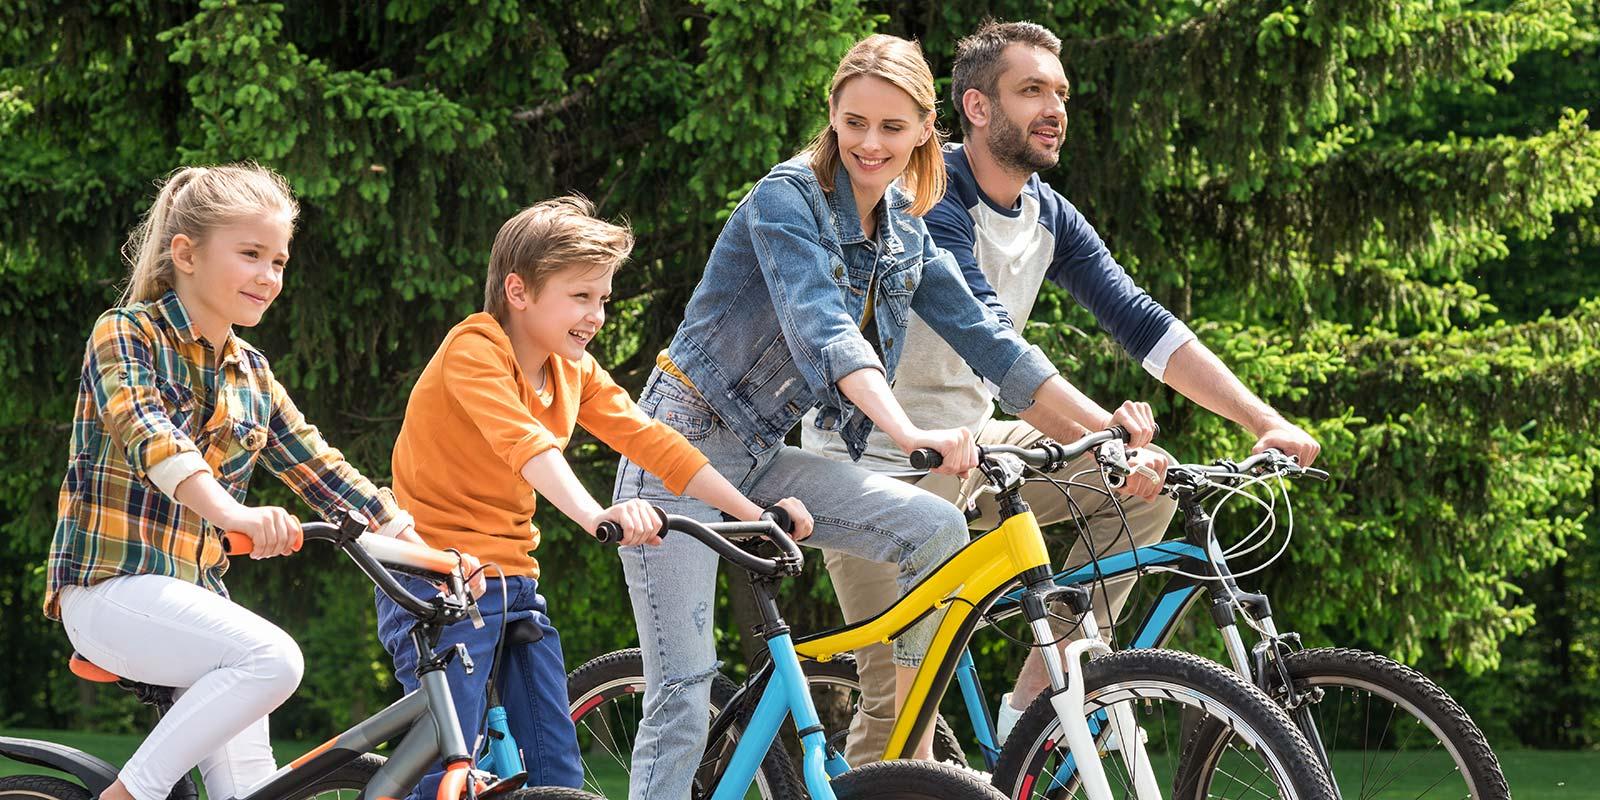 Radfahrer Familie bei Ausflug